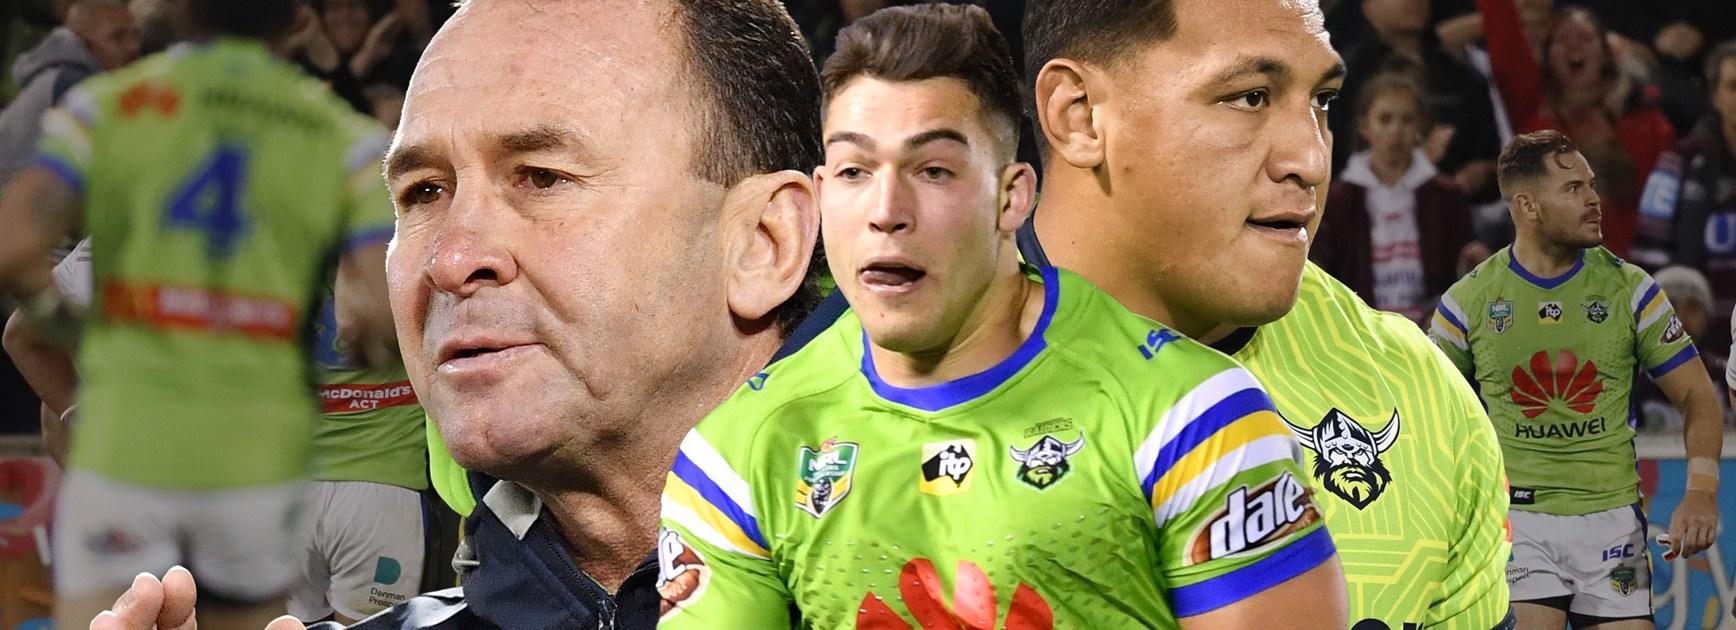 Canberra Raiders 2018 season review